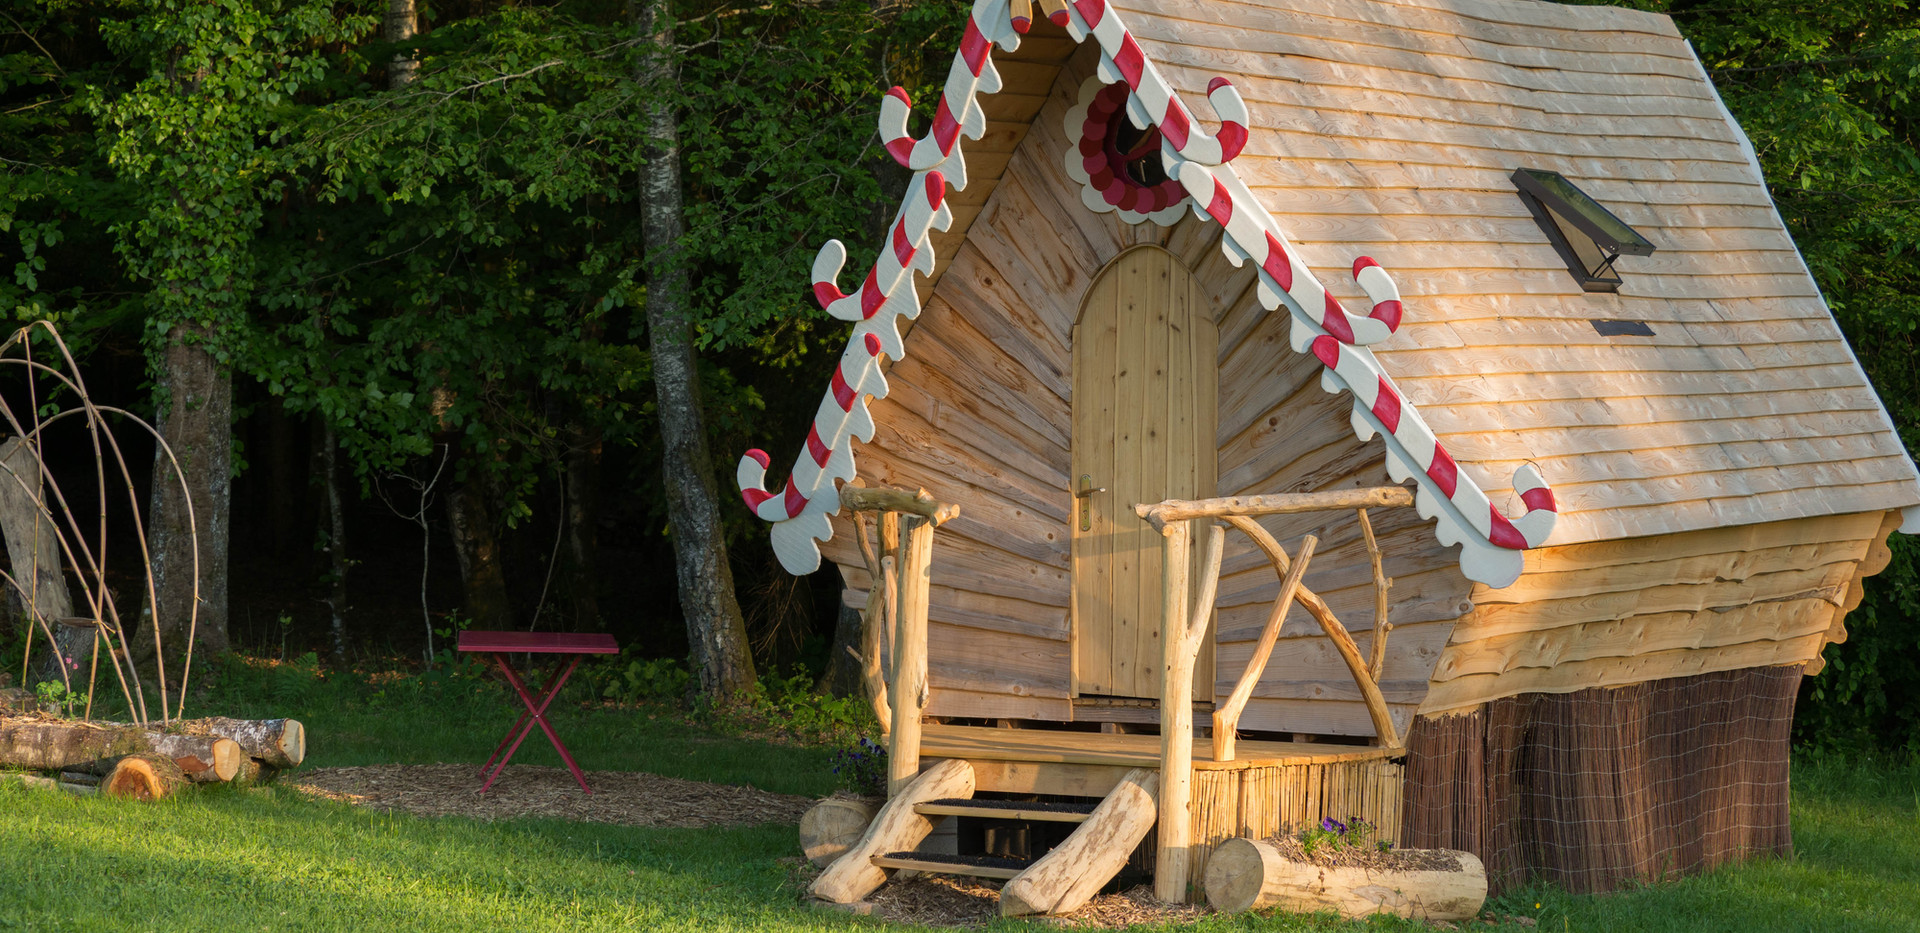 the unusual hansel and gretel hut